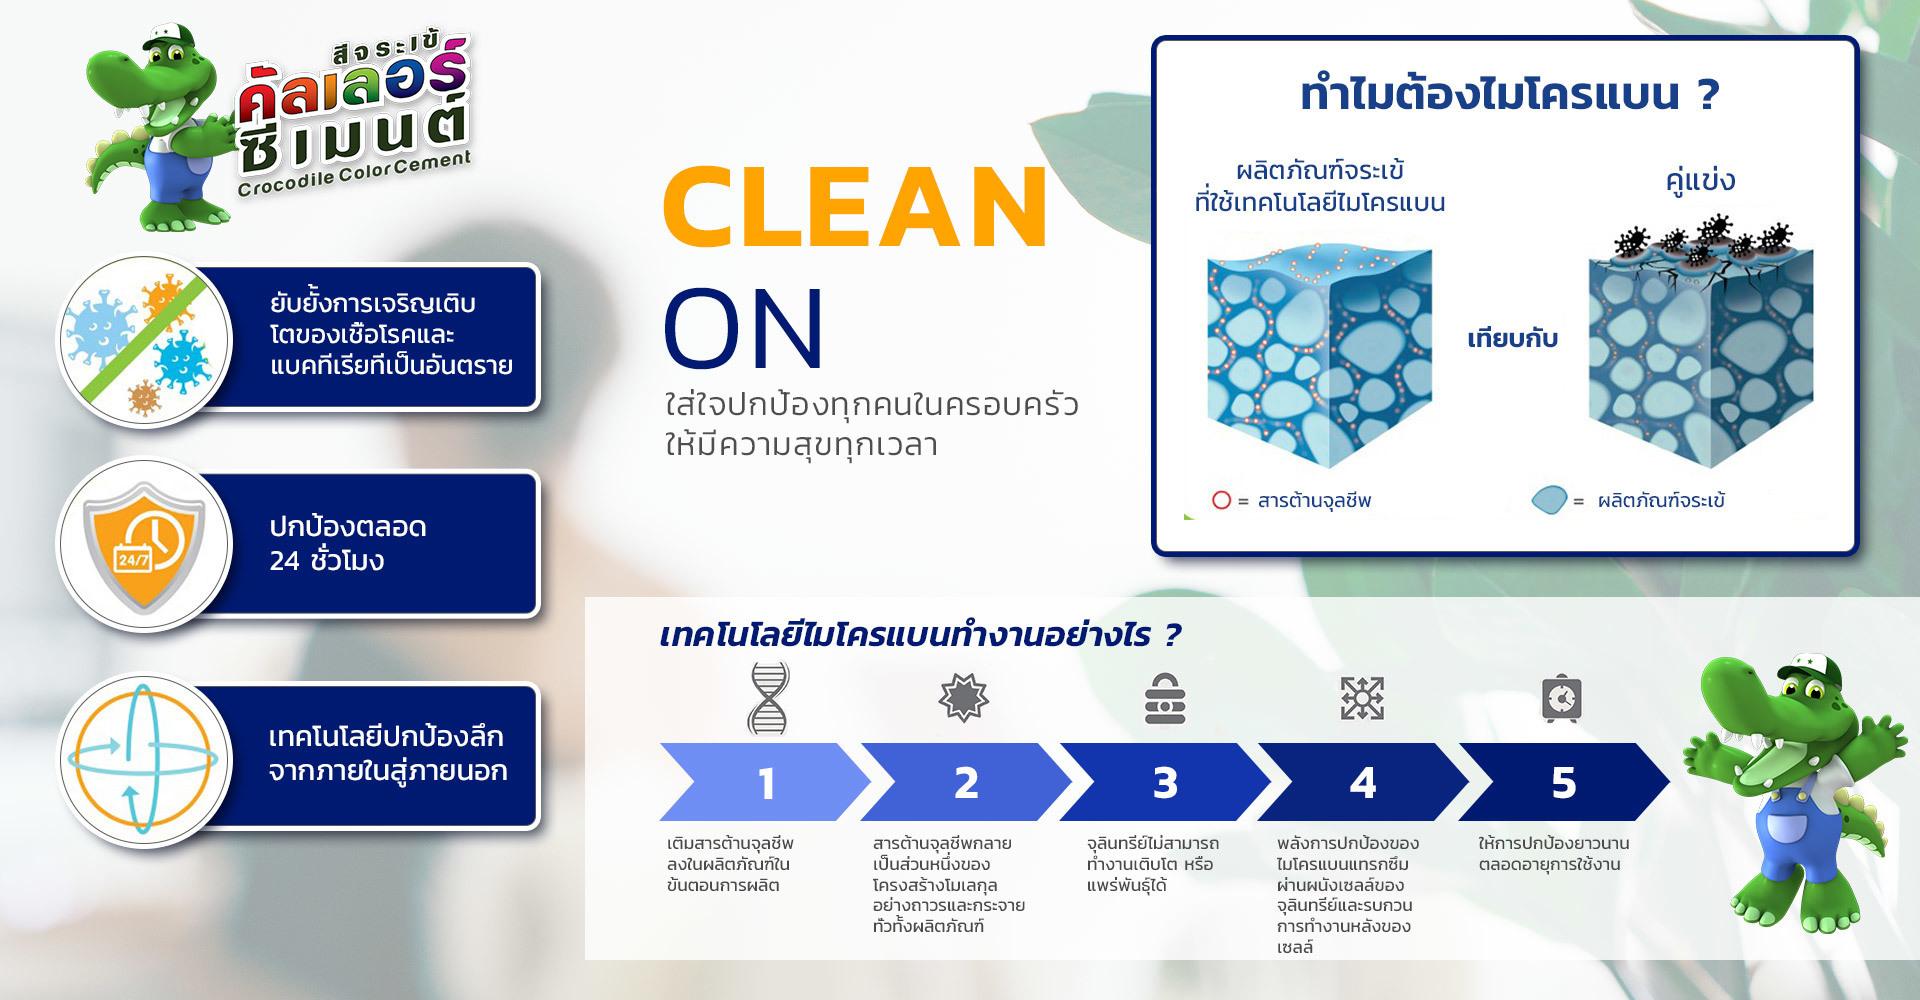 infographic_thai.jpg#asset:5064